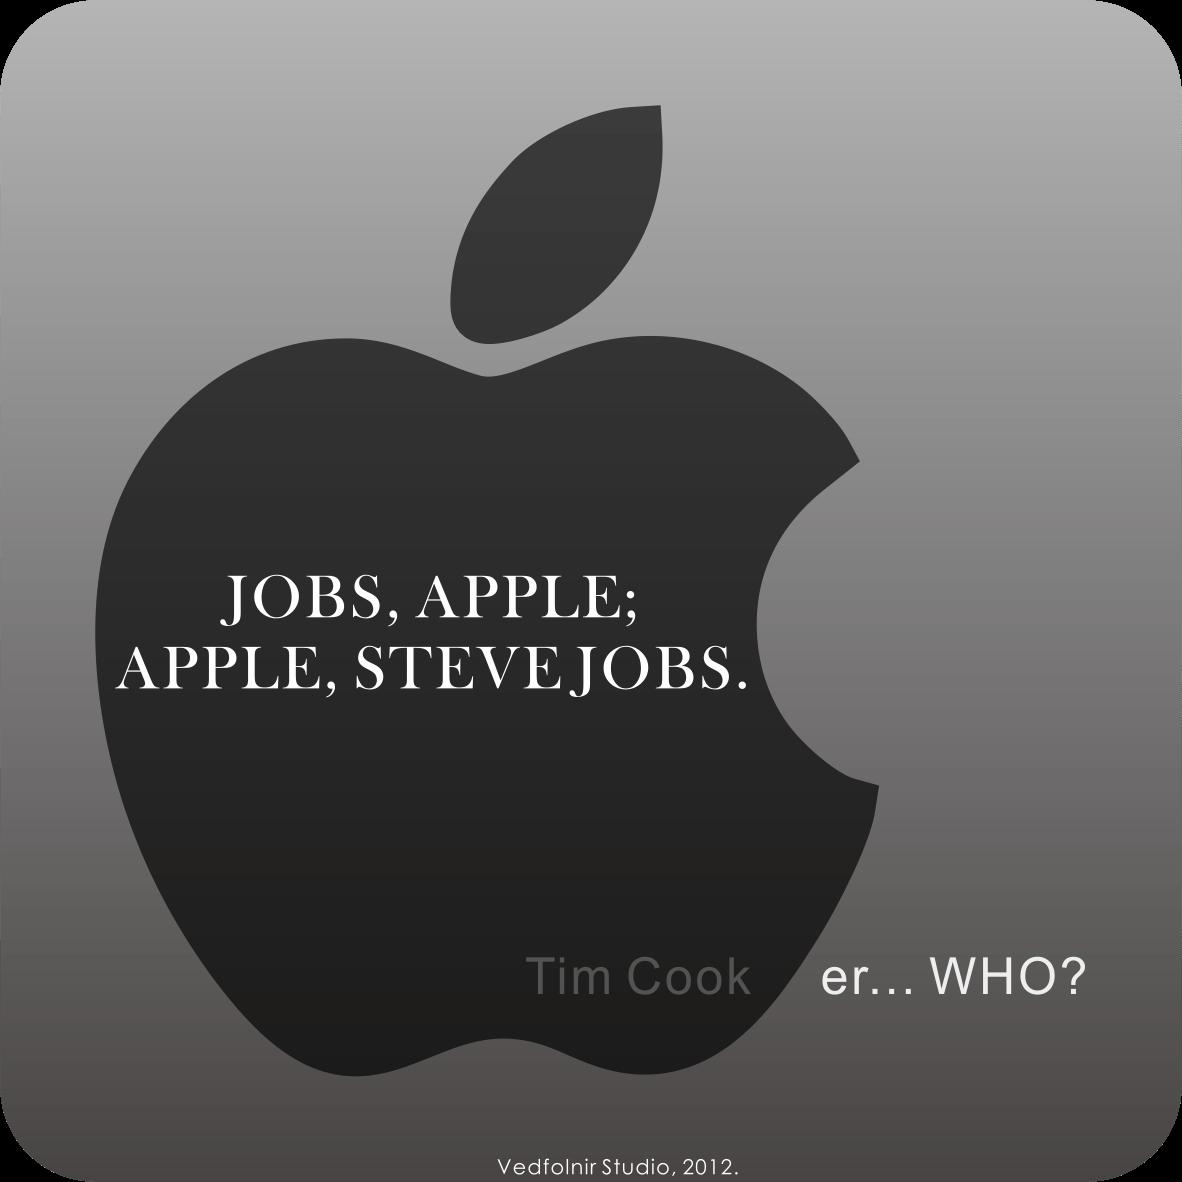 Steve Jobs Apple Tim Cook Steve Jobs and Apple, and Tim Cook.